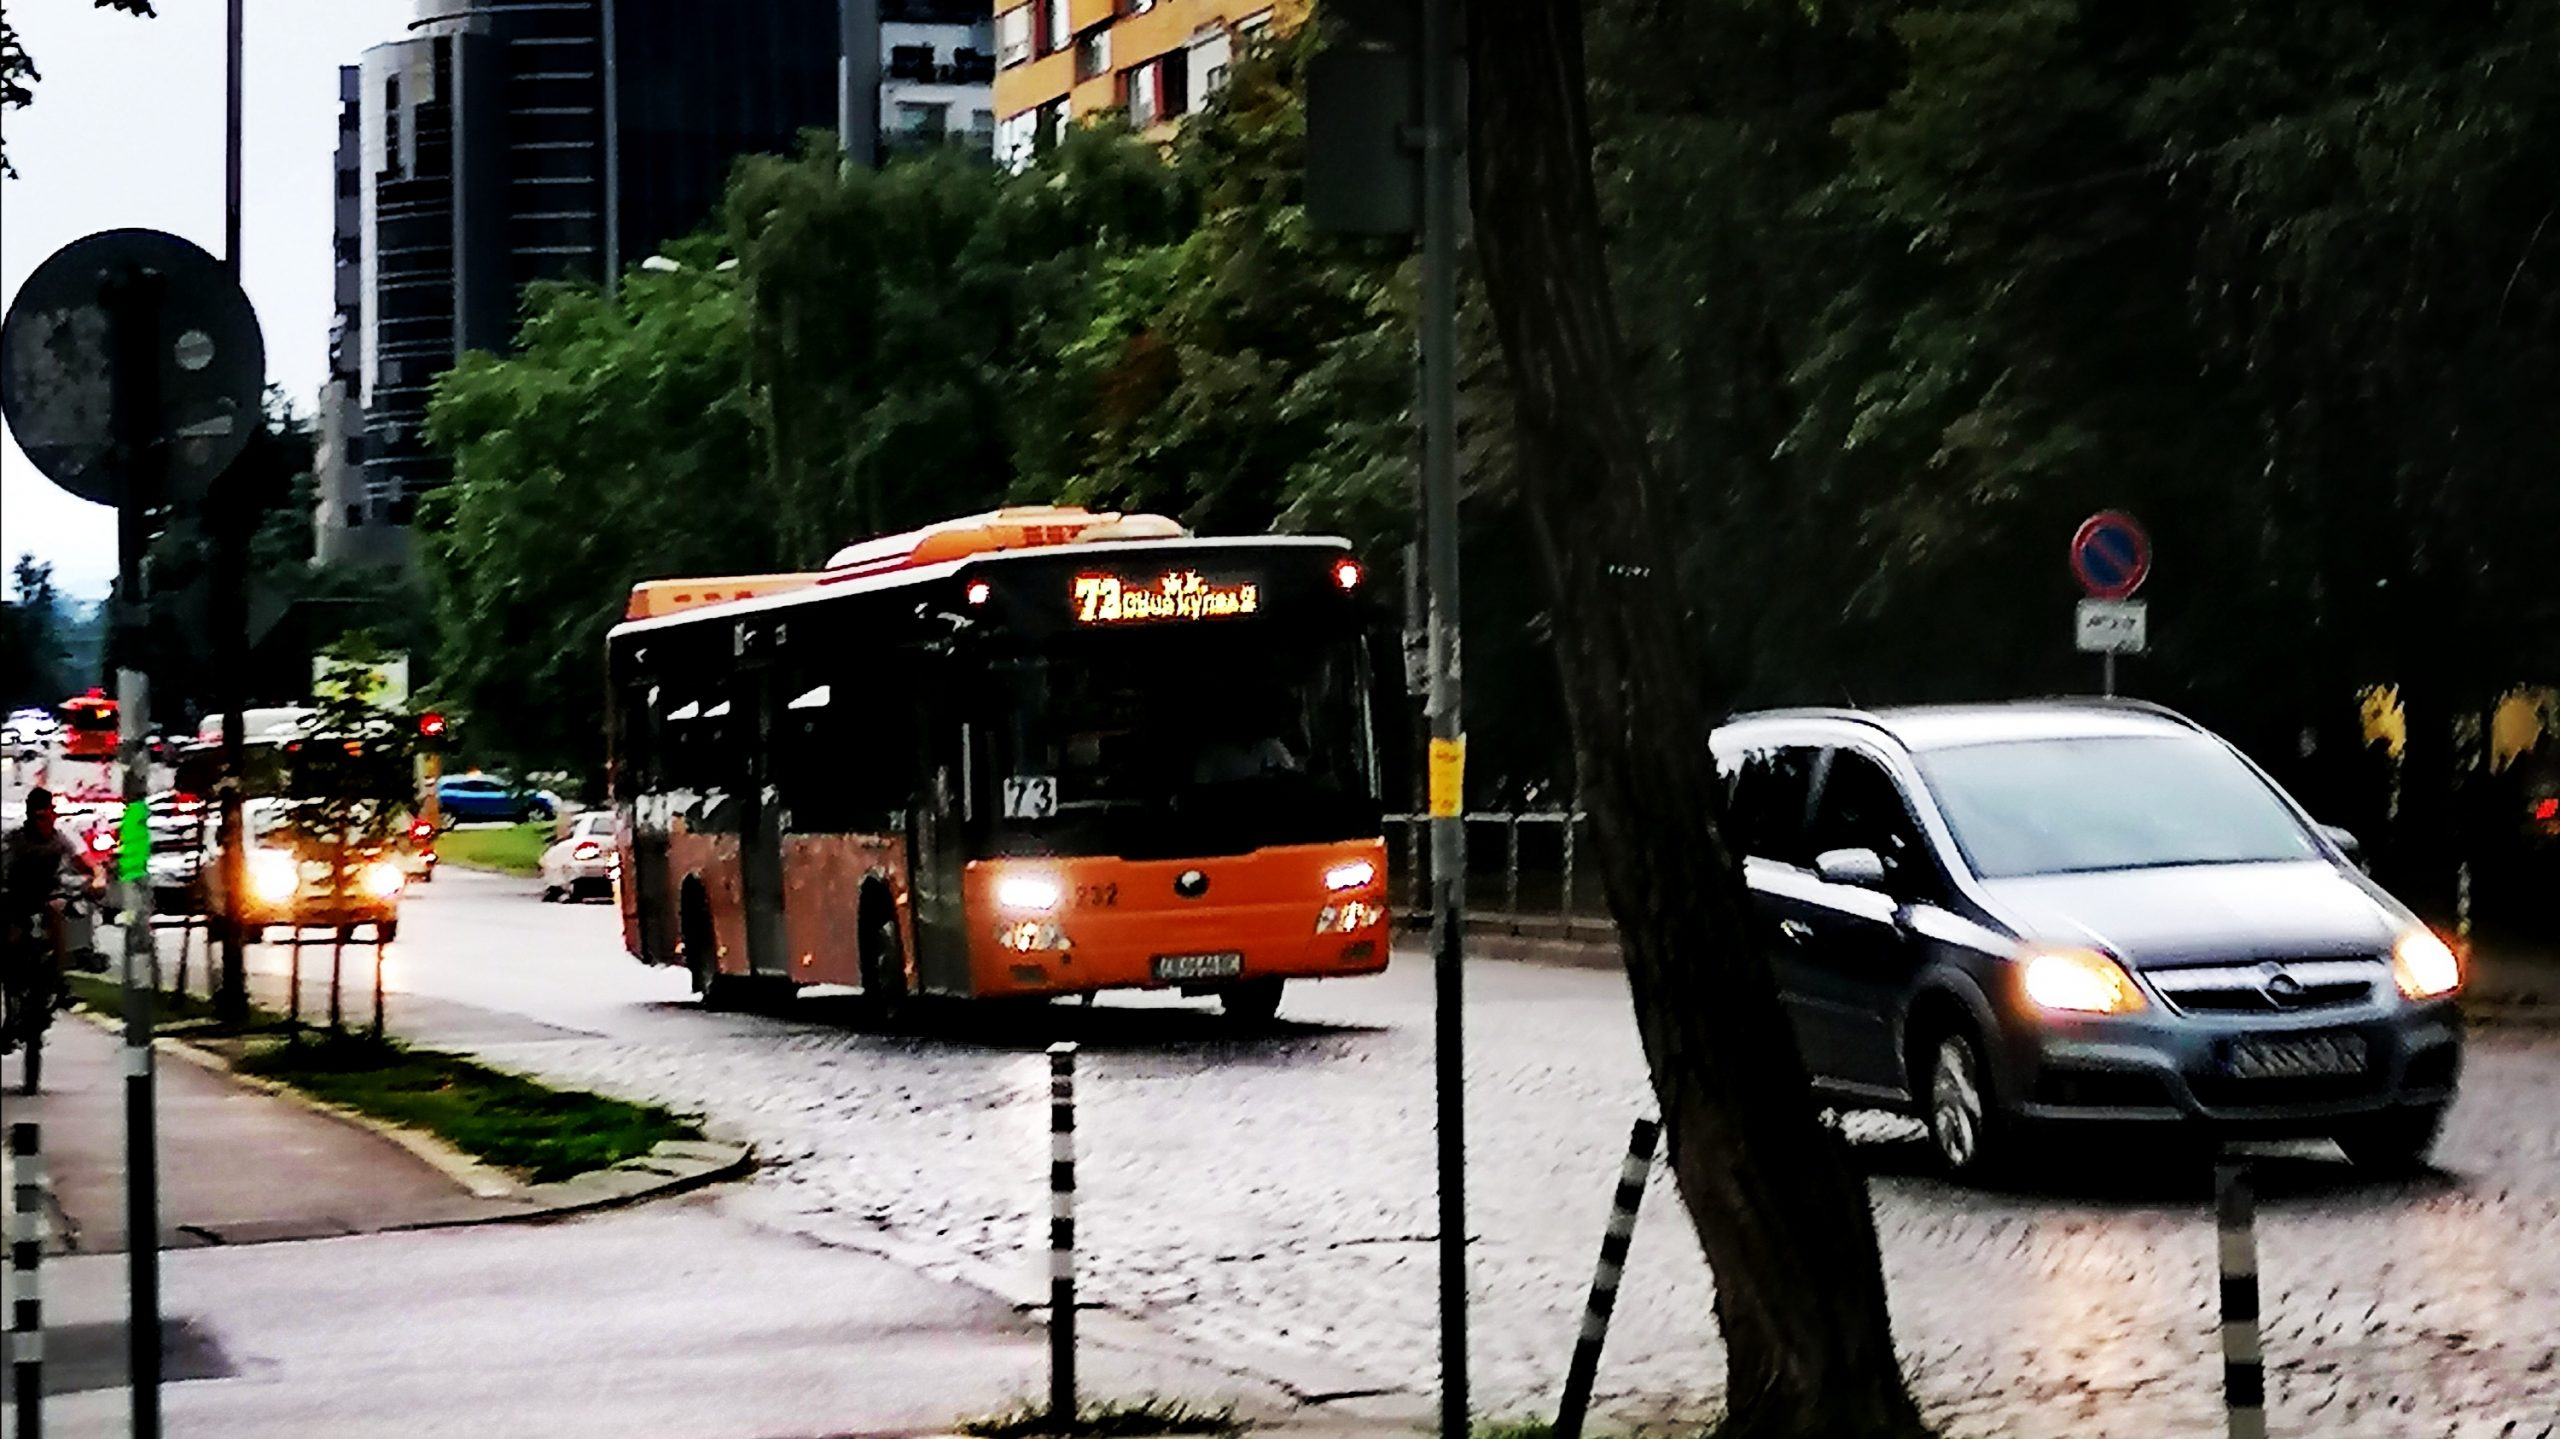 София: Реконструкция на бул. Тодор Каблешков променя маршрути на МГТ